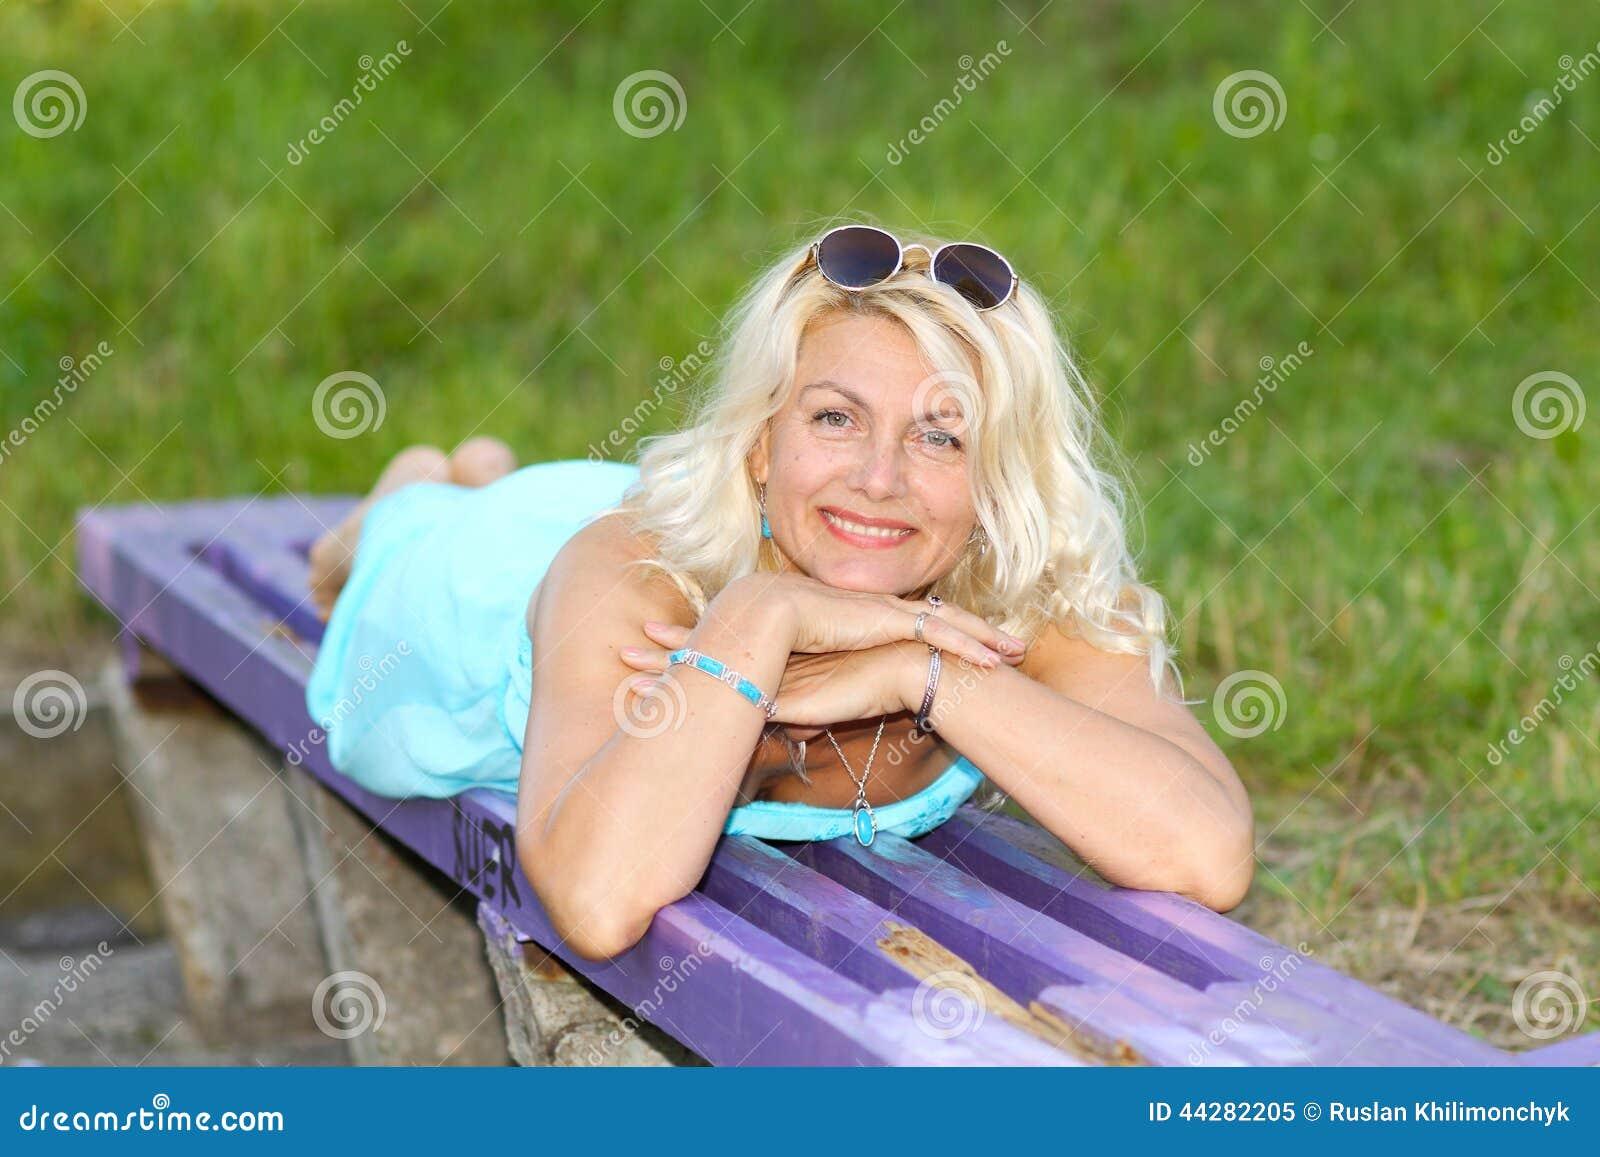 Mature blonde girl